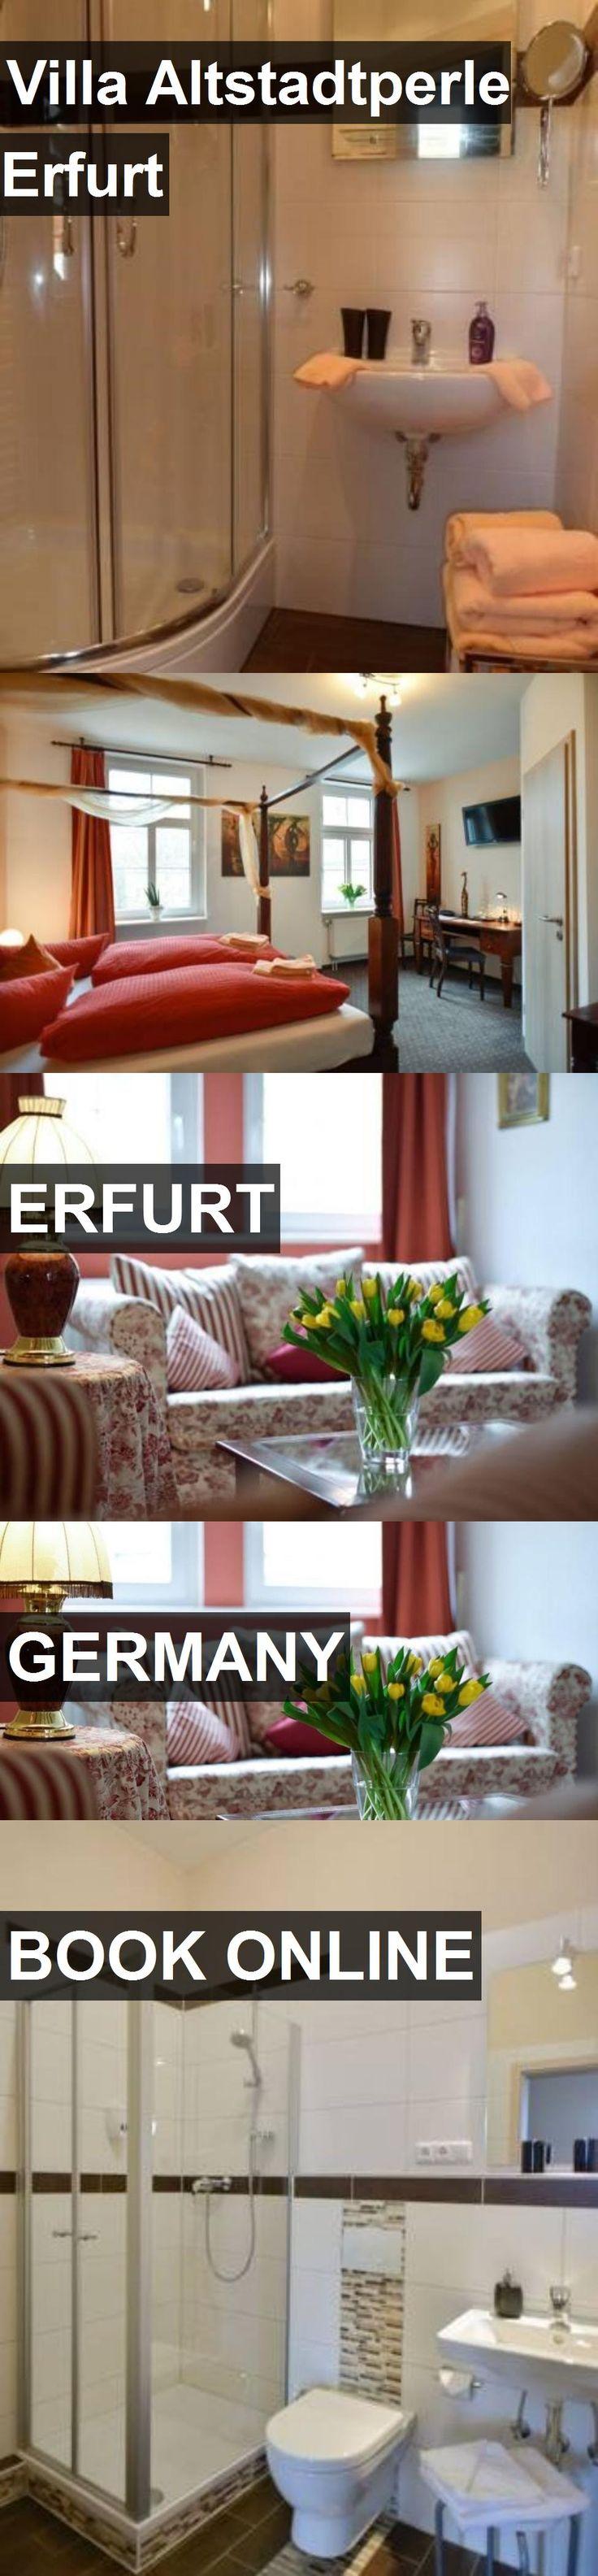 Hotel Villa Altstadtperle Erfurt in Erfurt, Germany. For more information, photos, reviews and best prices please follow the link. #Germany #Erfurt #VillaAltstadtperleErfurt #hotel #travel #vacation